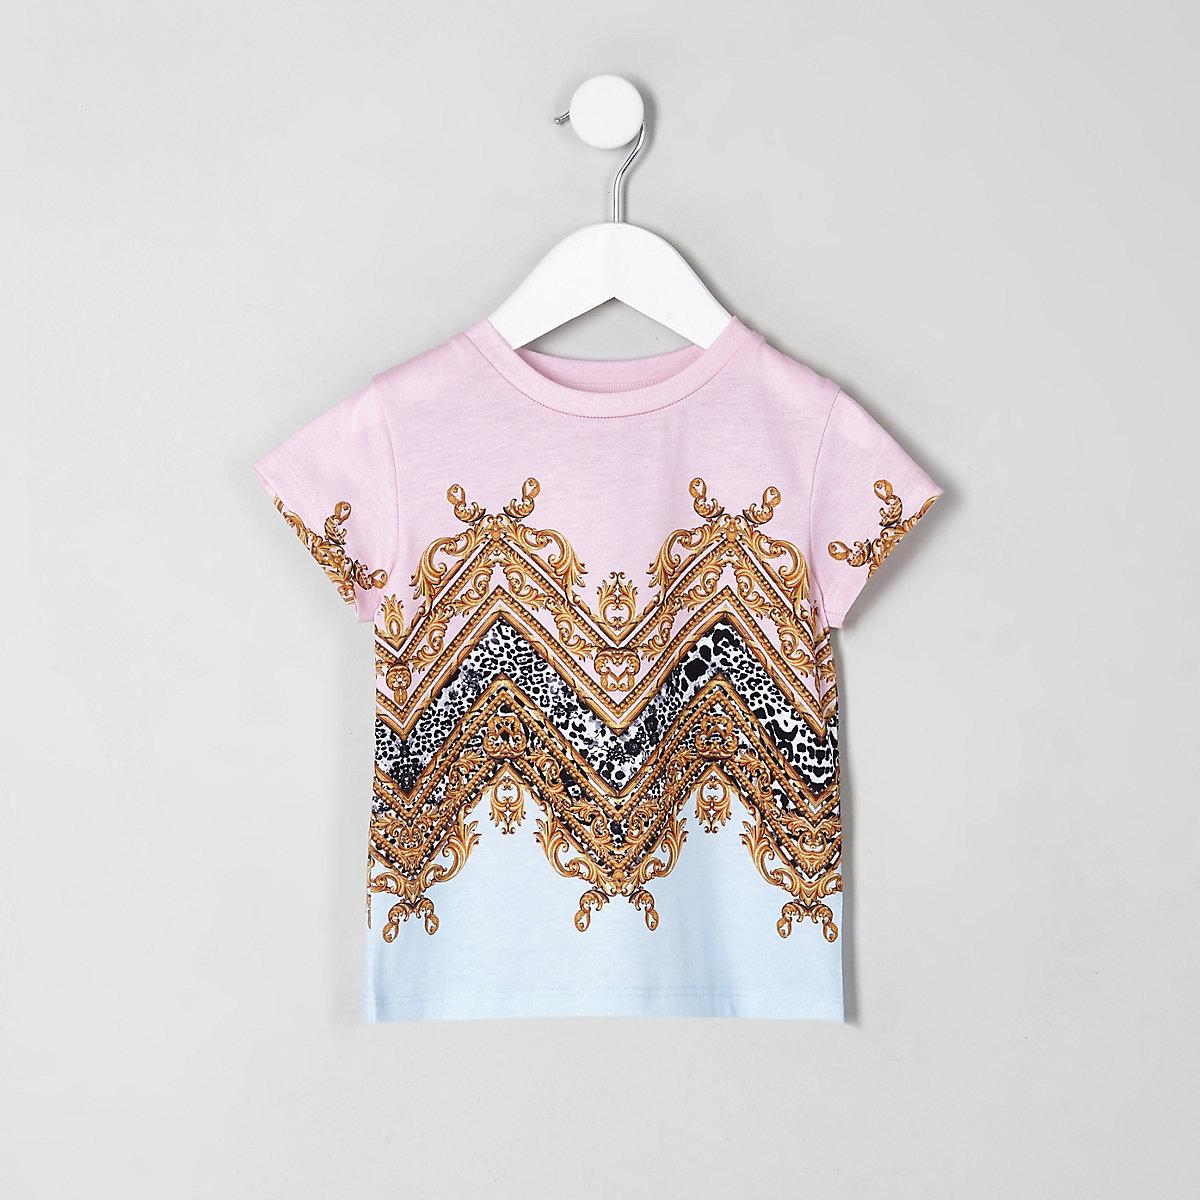 Pinkes T-Shirt mit Barock-Muster